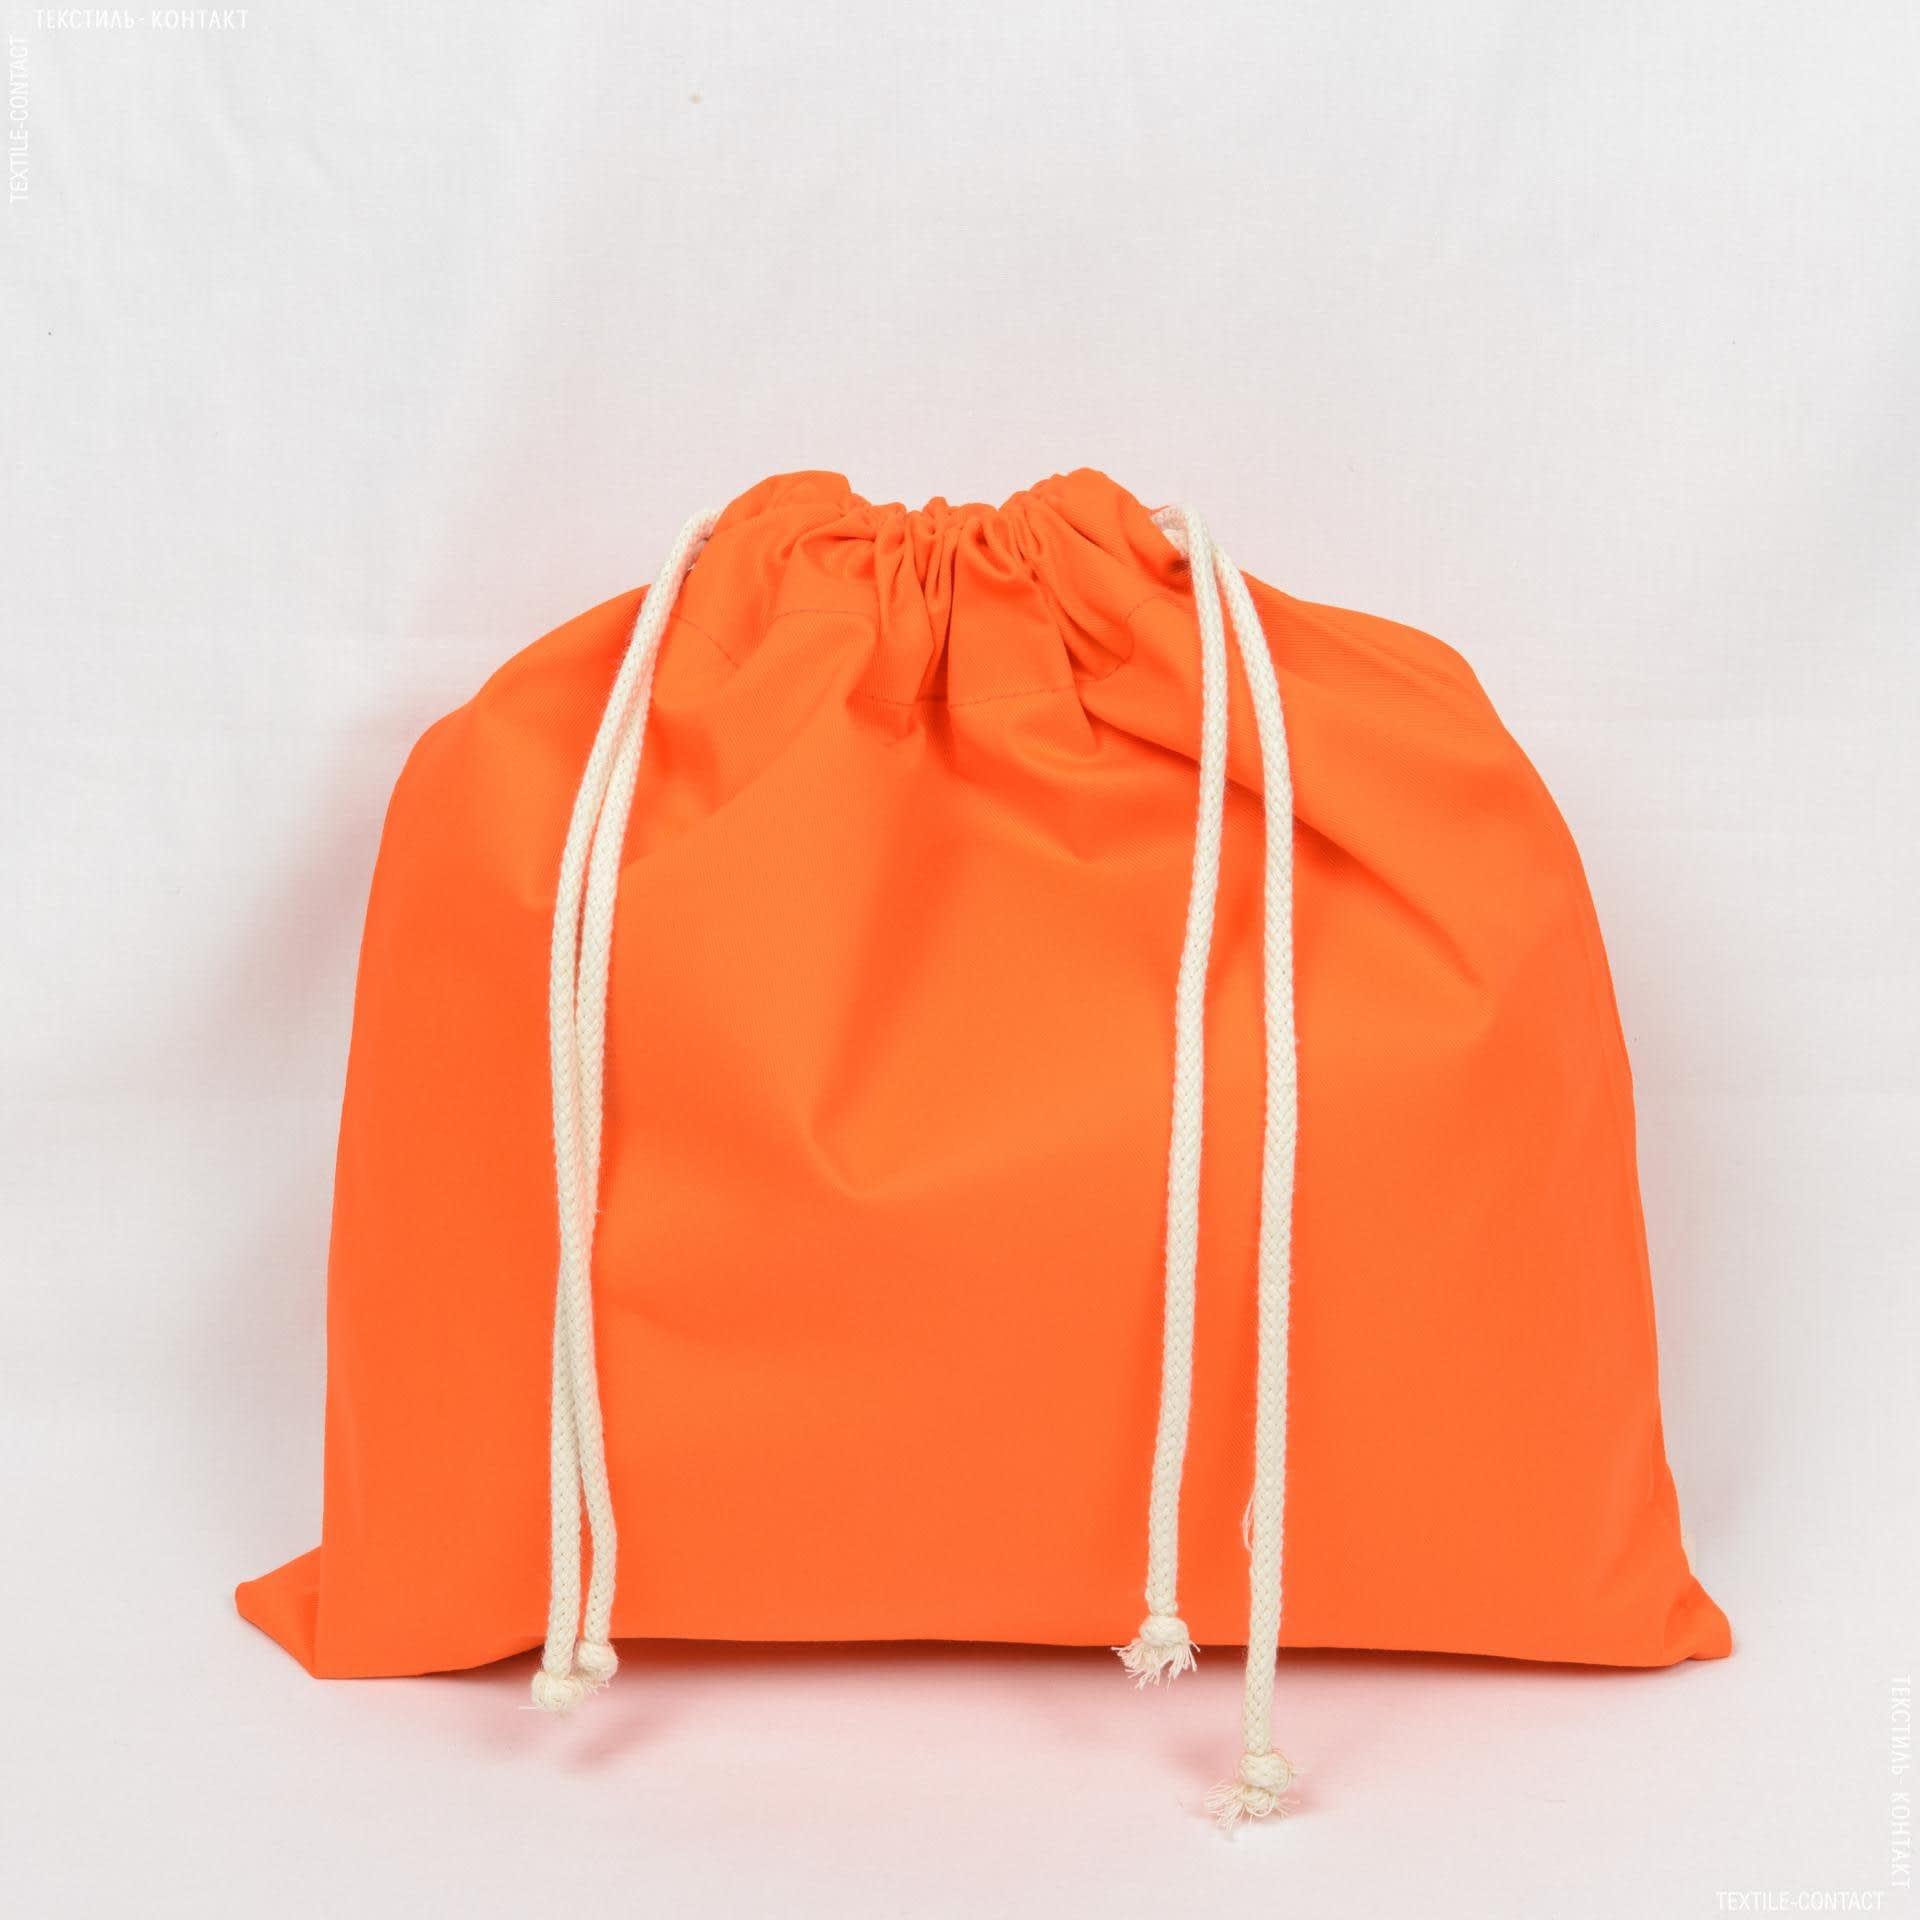 Ткани экосумка - Мешочек саржа оранжевый 40х40